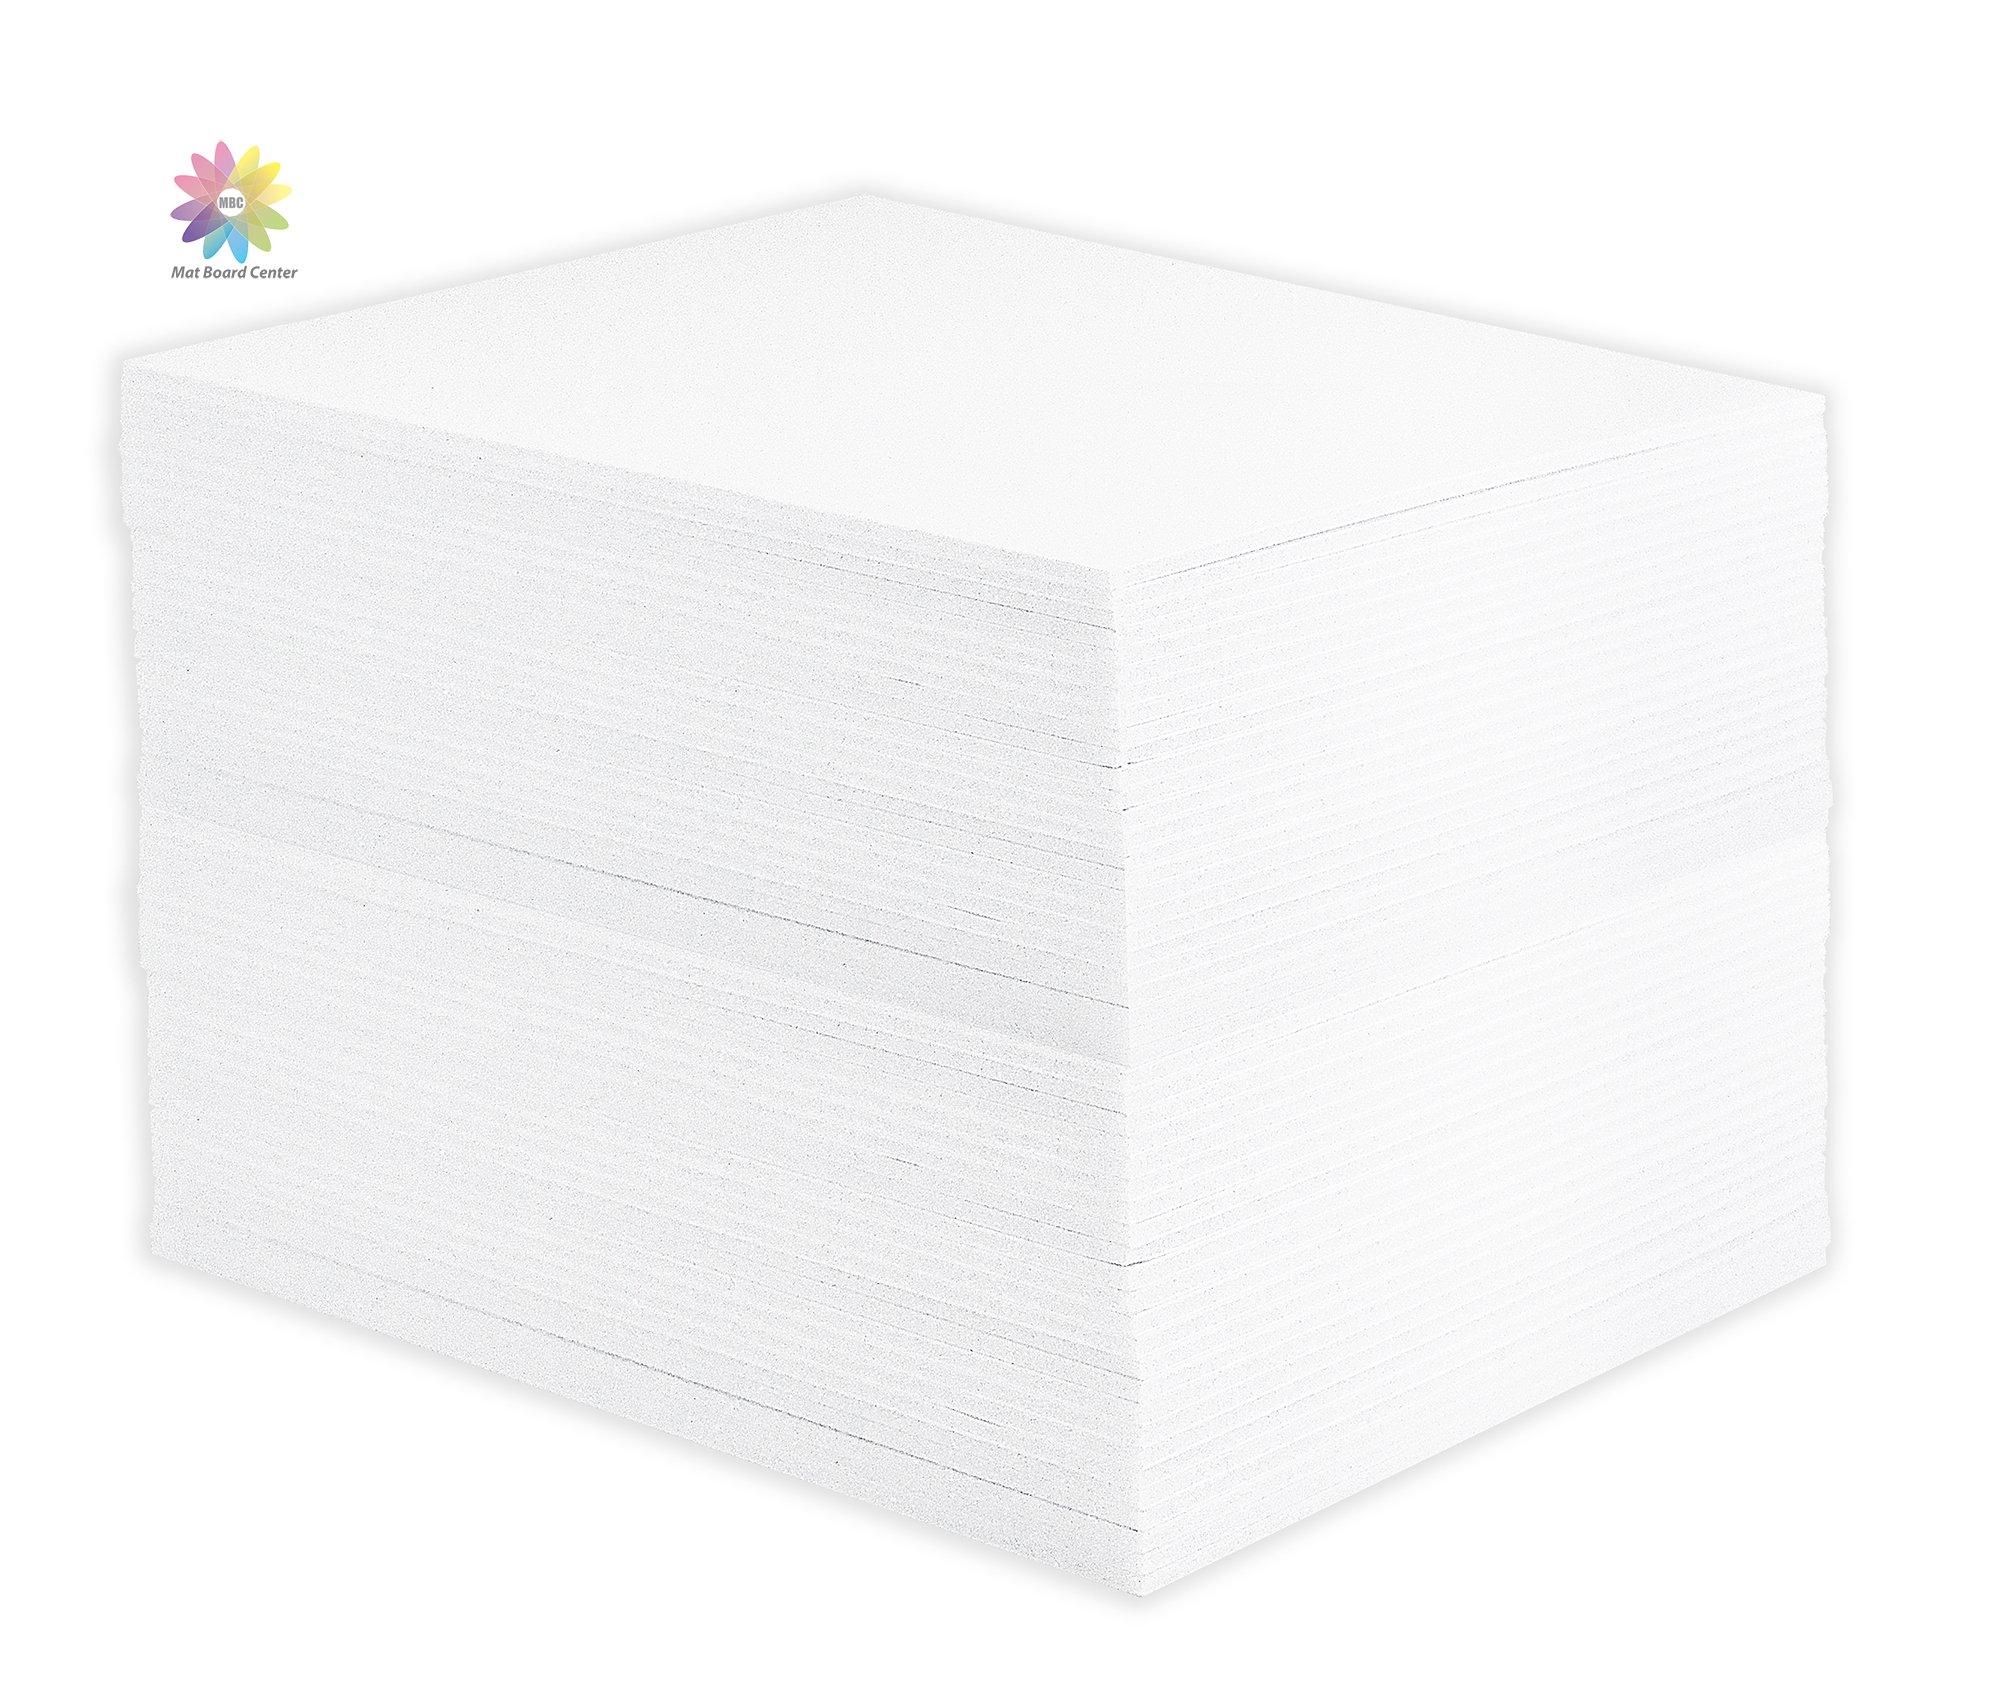 Mat Board Center, Pack of 50 8x10 1/8'' White Foam Core Backing Boards